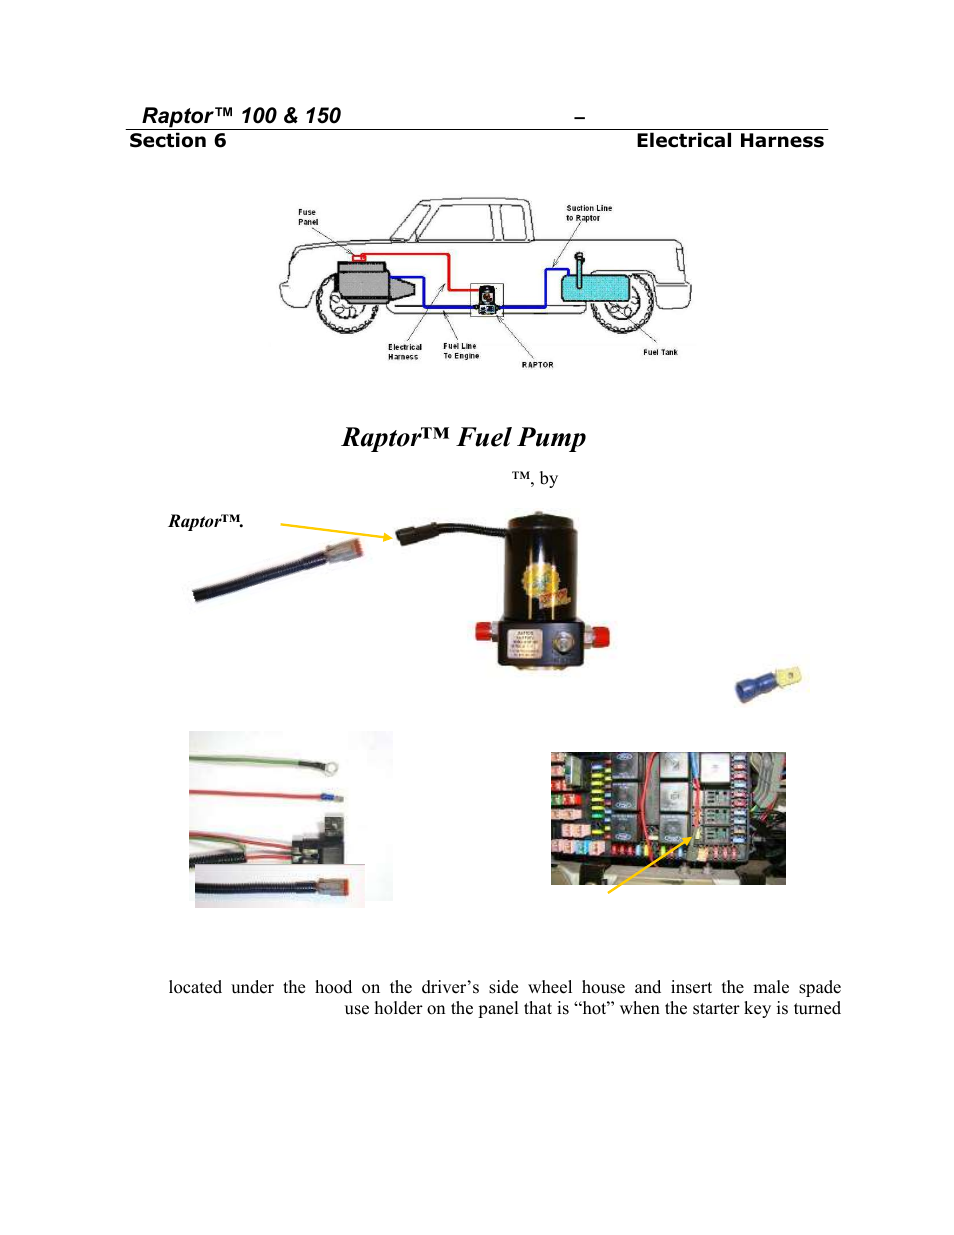 [SCHEMATICS_4JK]  Installing the raptor™ fuel pump wiring harness | PureFlow AirDog RP-150 -  Dodge Cummins 2005-2013 User Manual | Page 12 / 15 | Airdog Wiring Diagrams |  | Manuals Directory